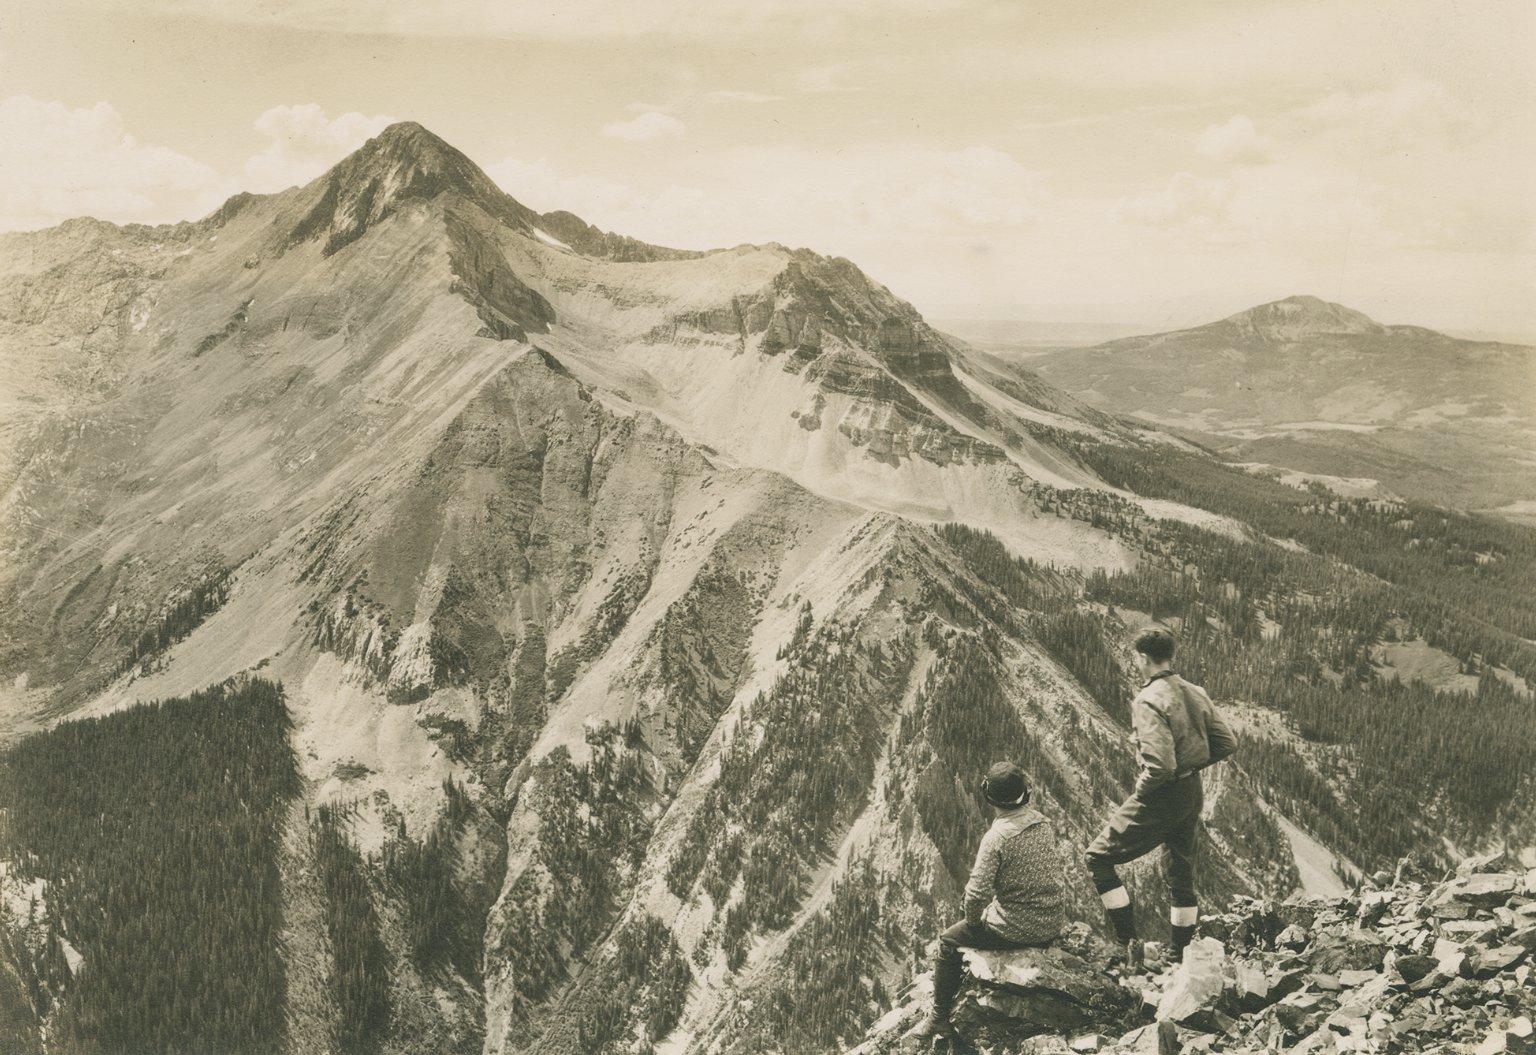 Wilson Peak from summit of Sunshine Peak.